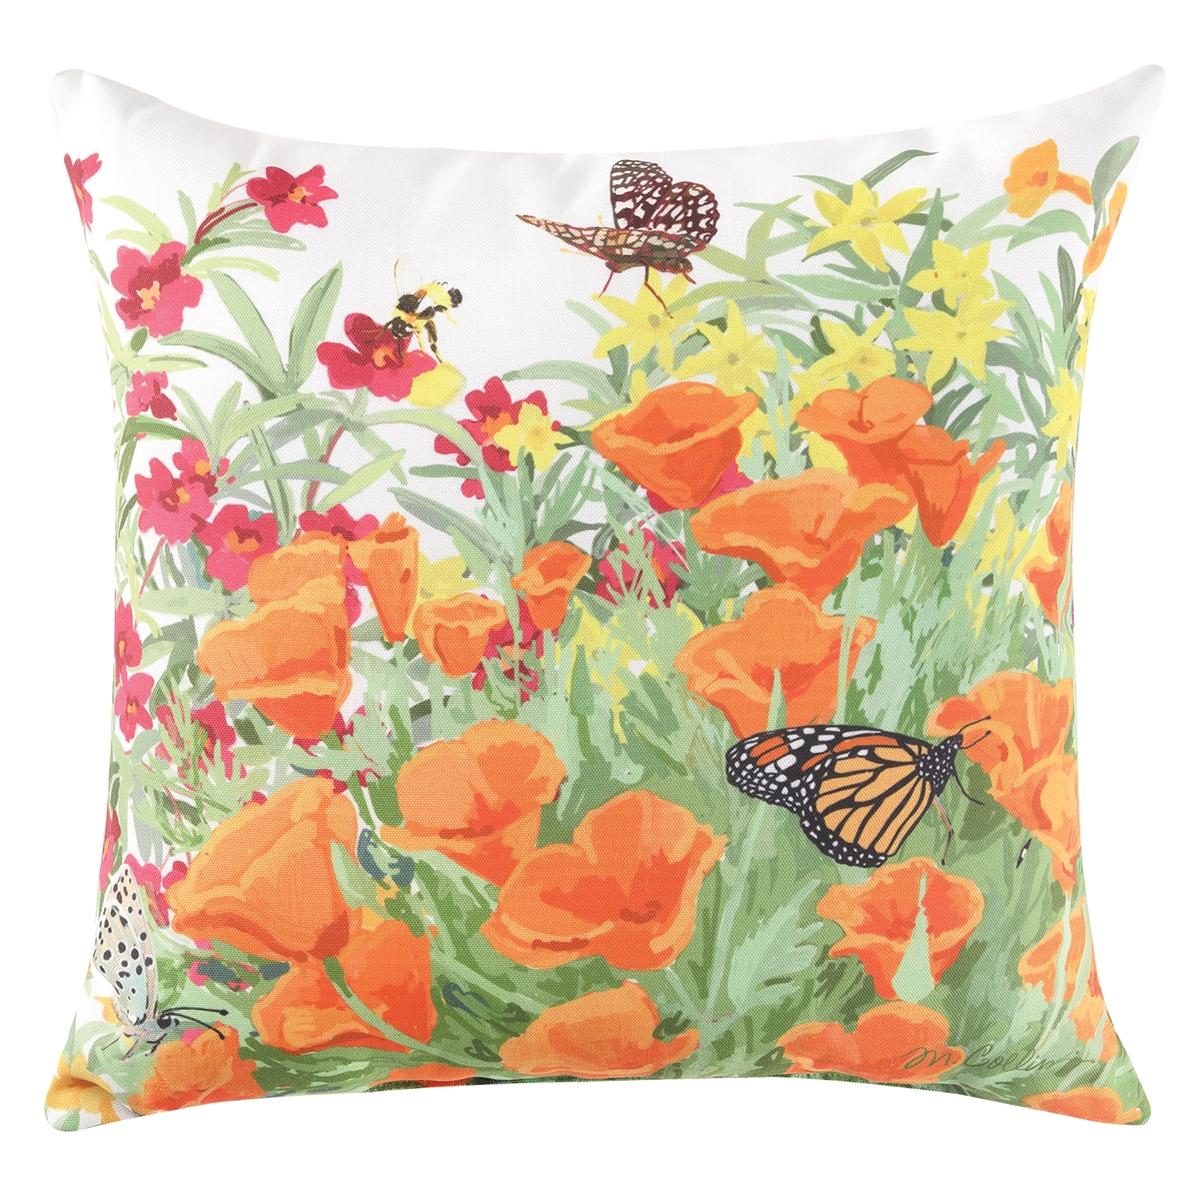 Garden Floral Pillow